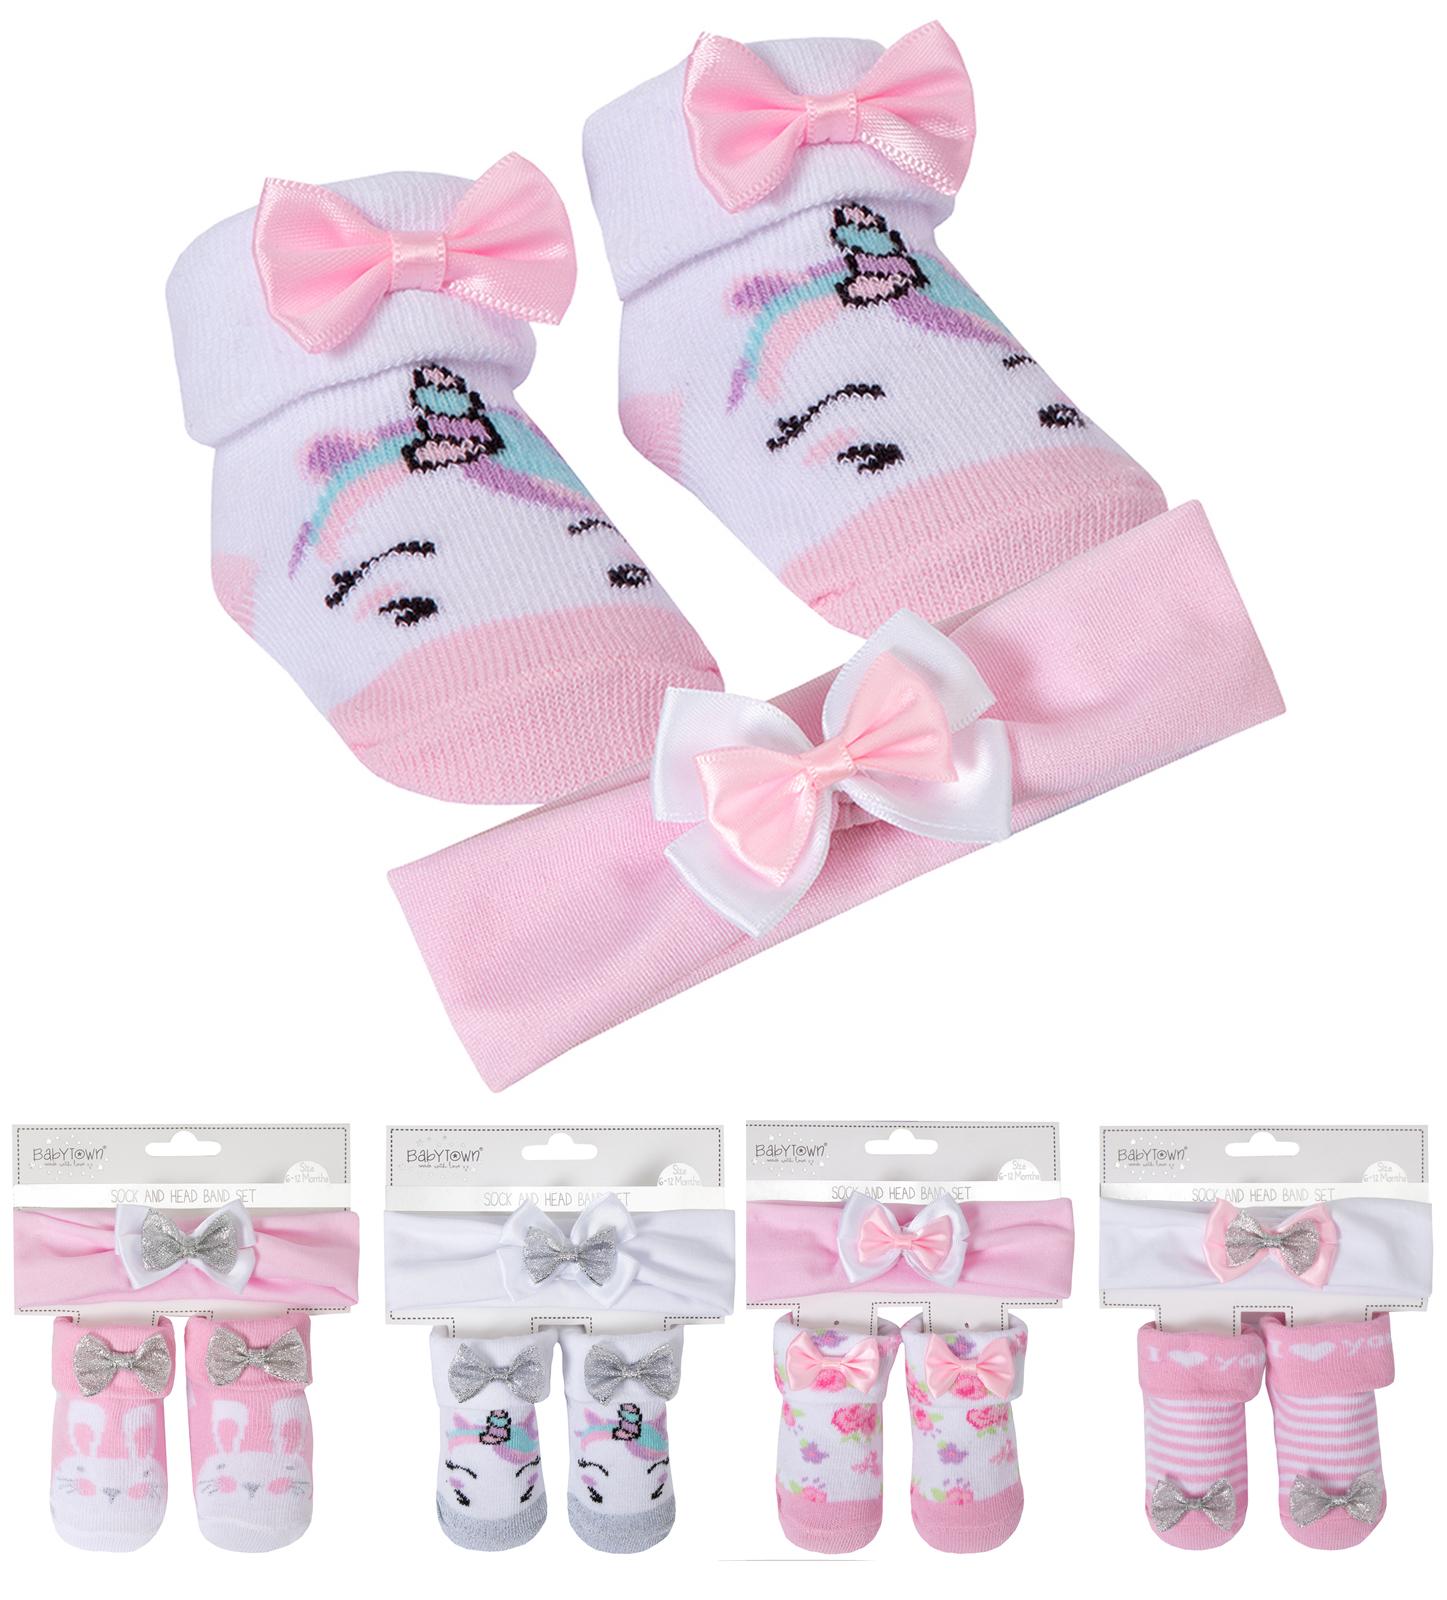 Baby Girls Headband Socks Gift Set Unicorn Glitter Bow Cute Babies